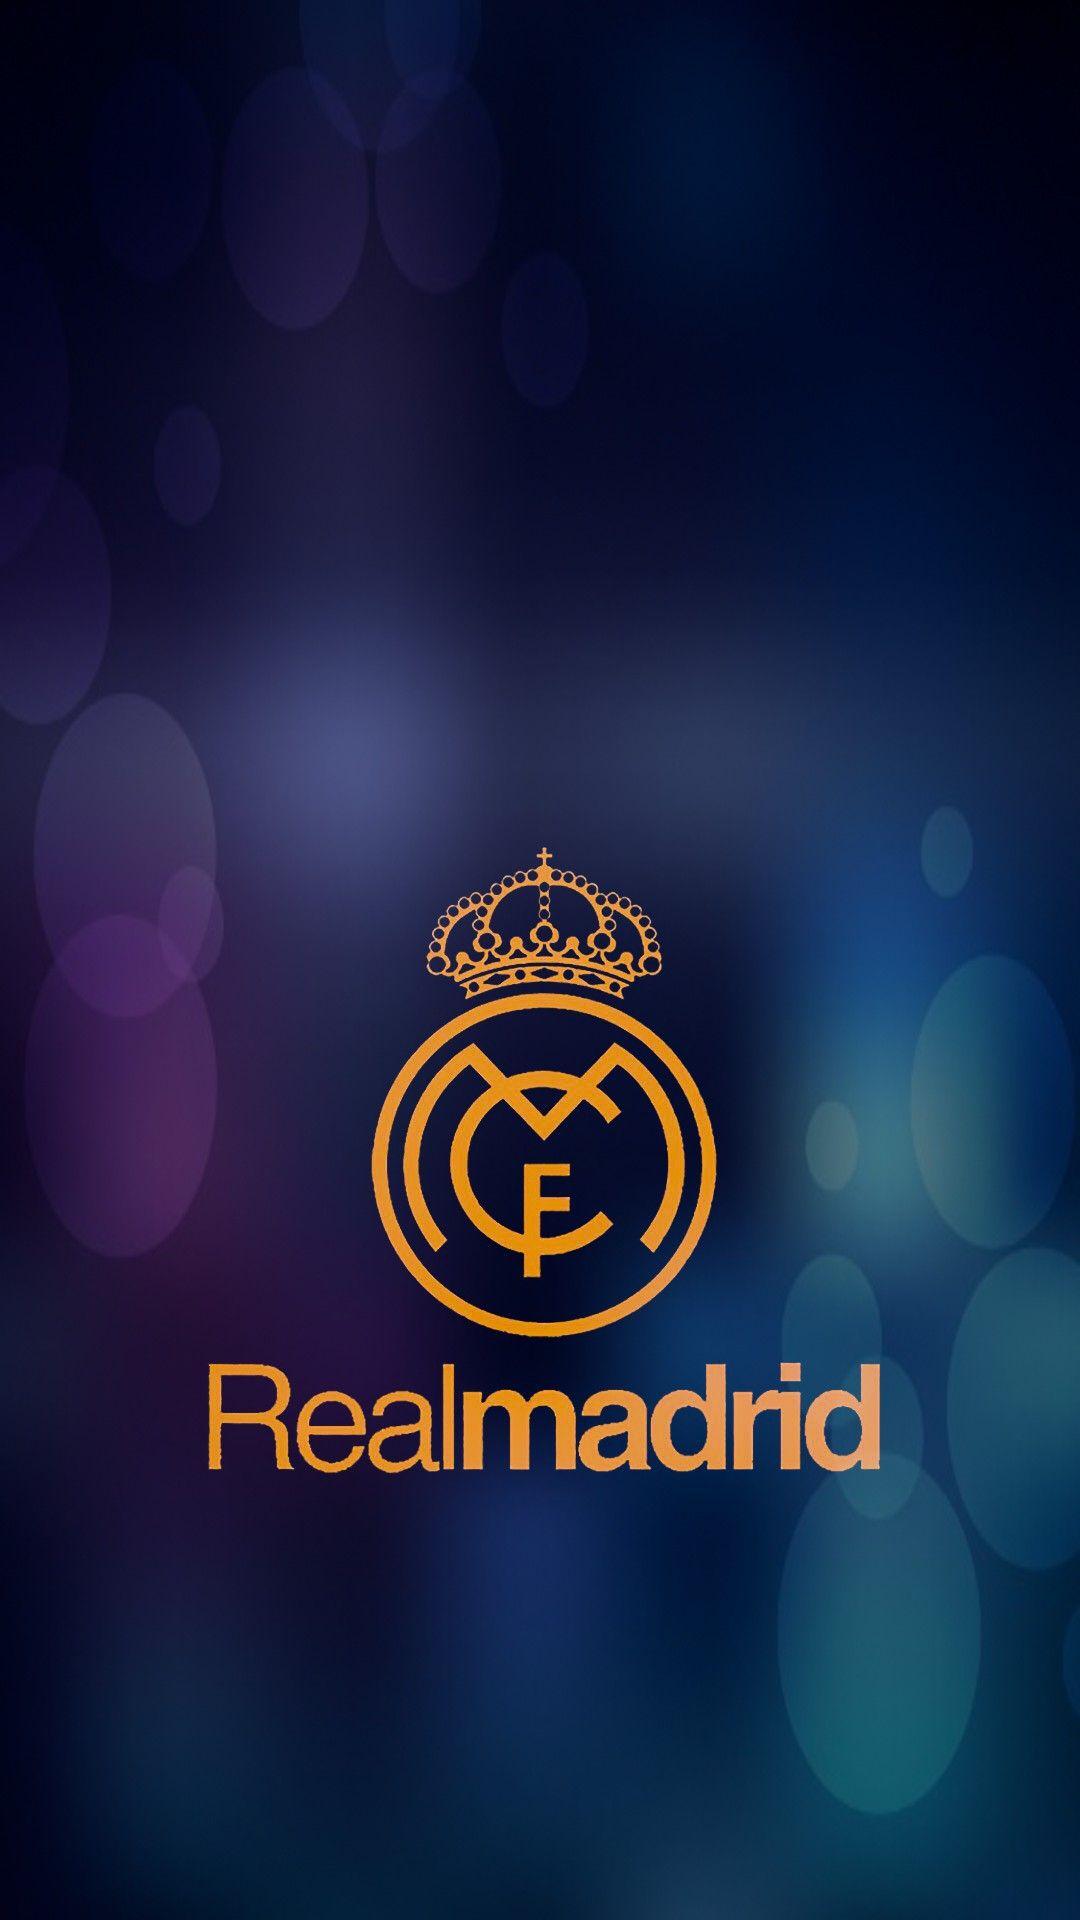 HD Real Madrid FC Wallpaper Logo 2